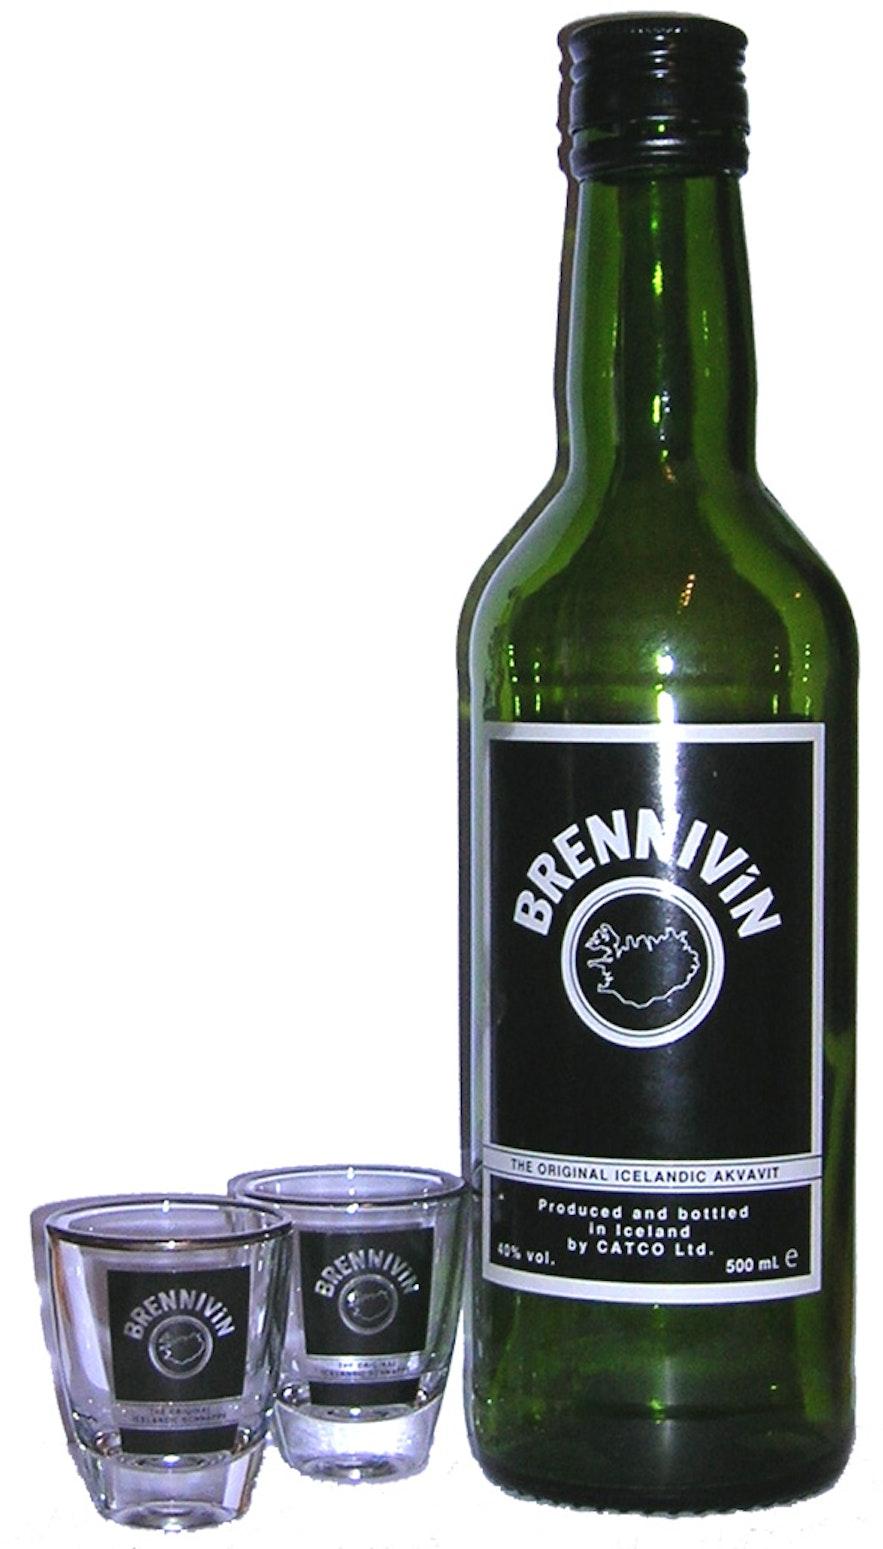 Brennivin is the main spirit of Iceland.